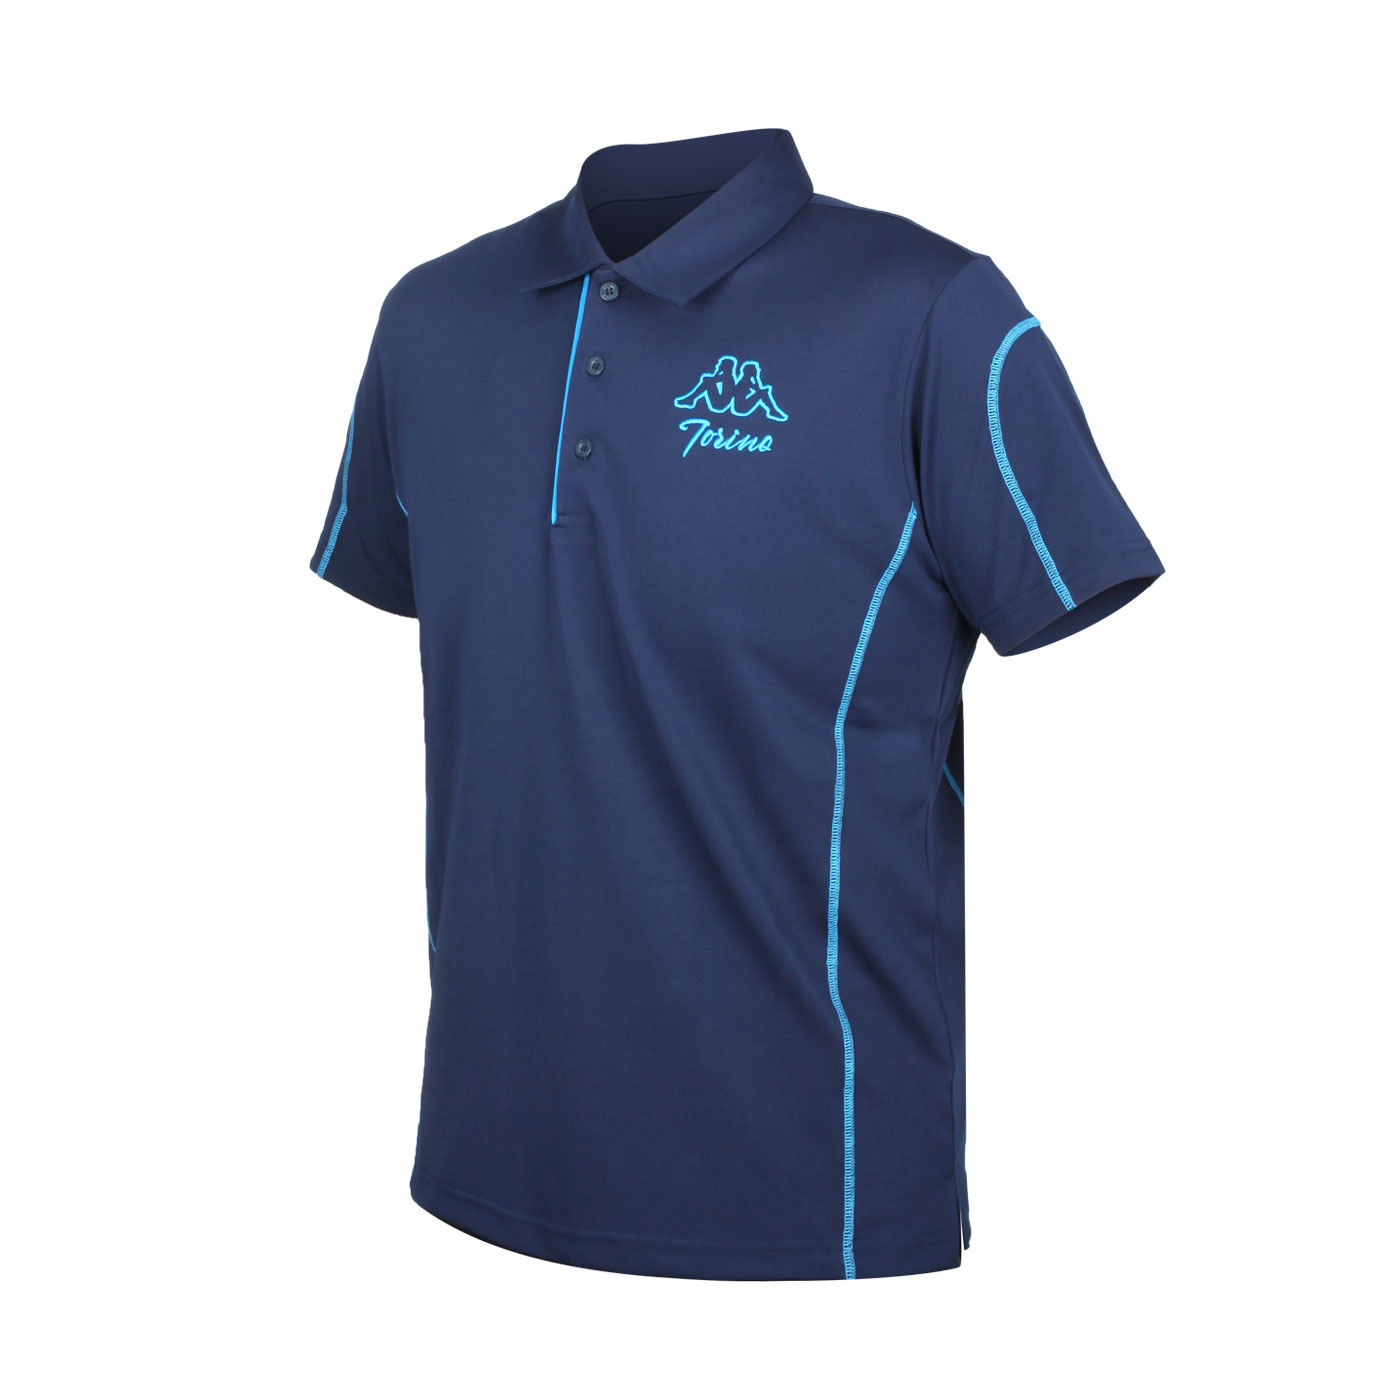 KAPPA 男款短袖POLO衫 321754W-B29 - 丈青藍